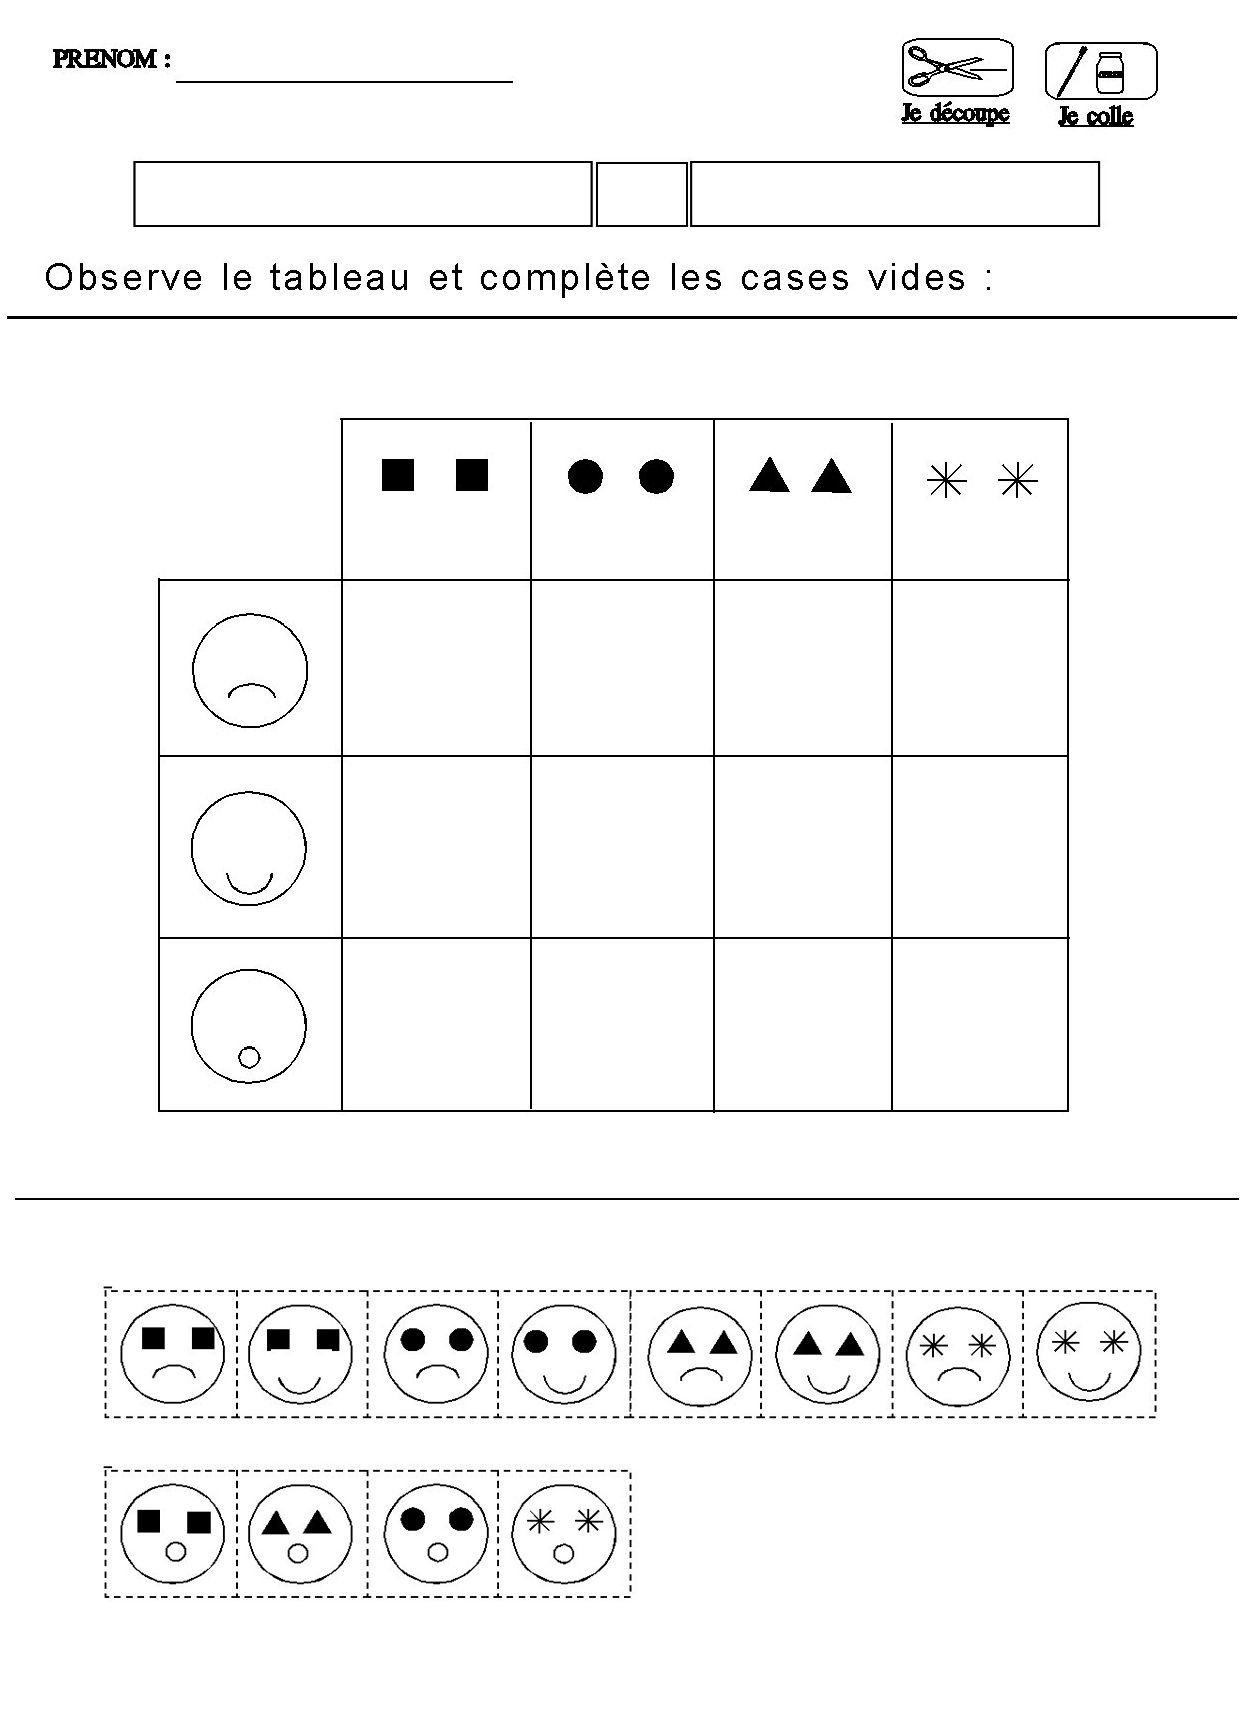 Tableau Double Entrees Pour Maternelle Moyenne Section encequiconcerne Exercices Moyenne Section Maternelle À Imprimer